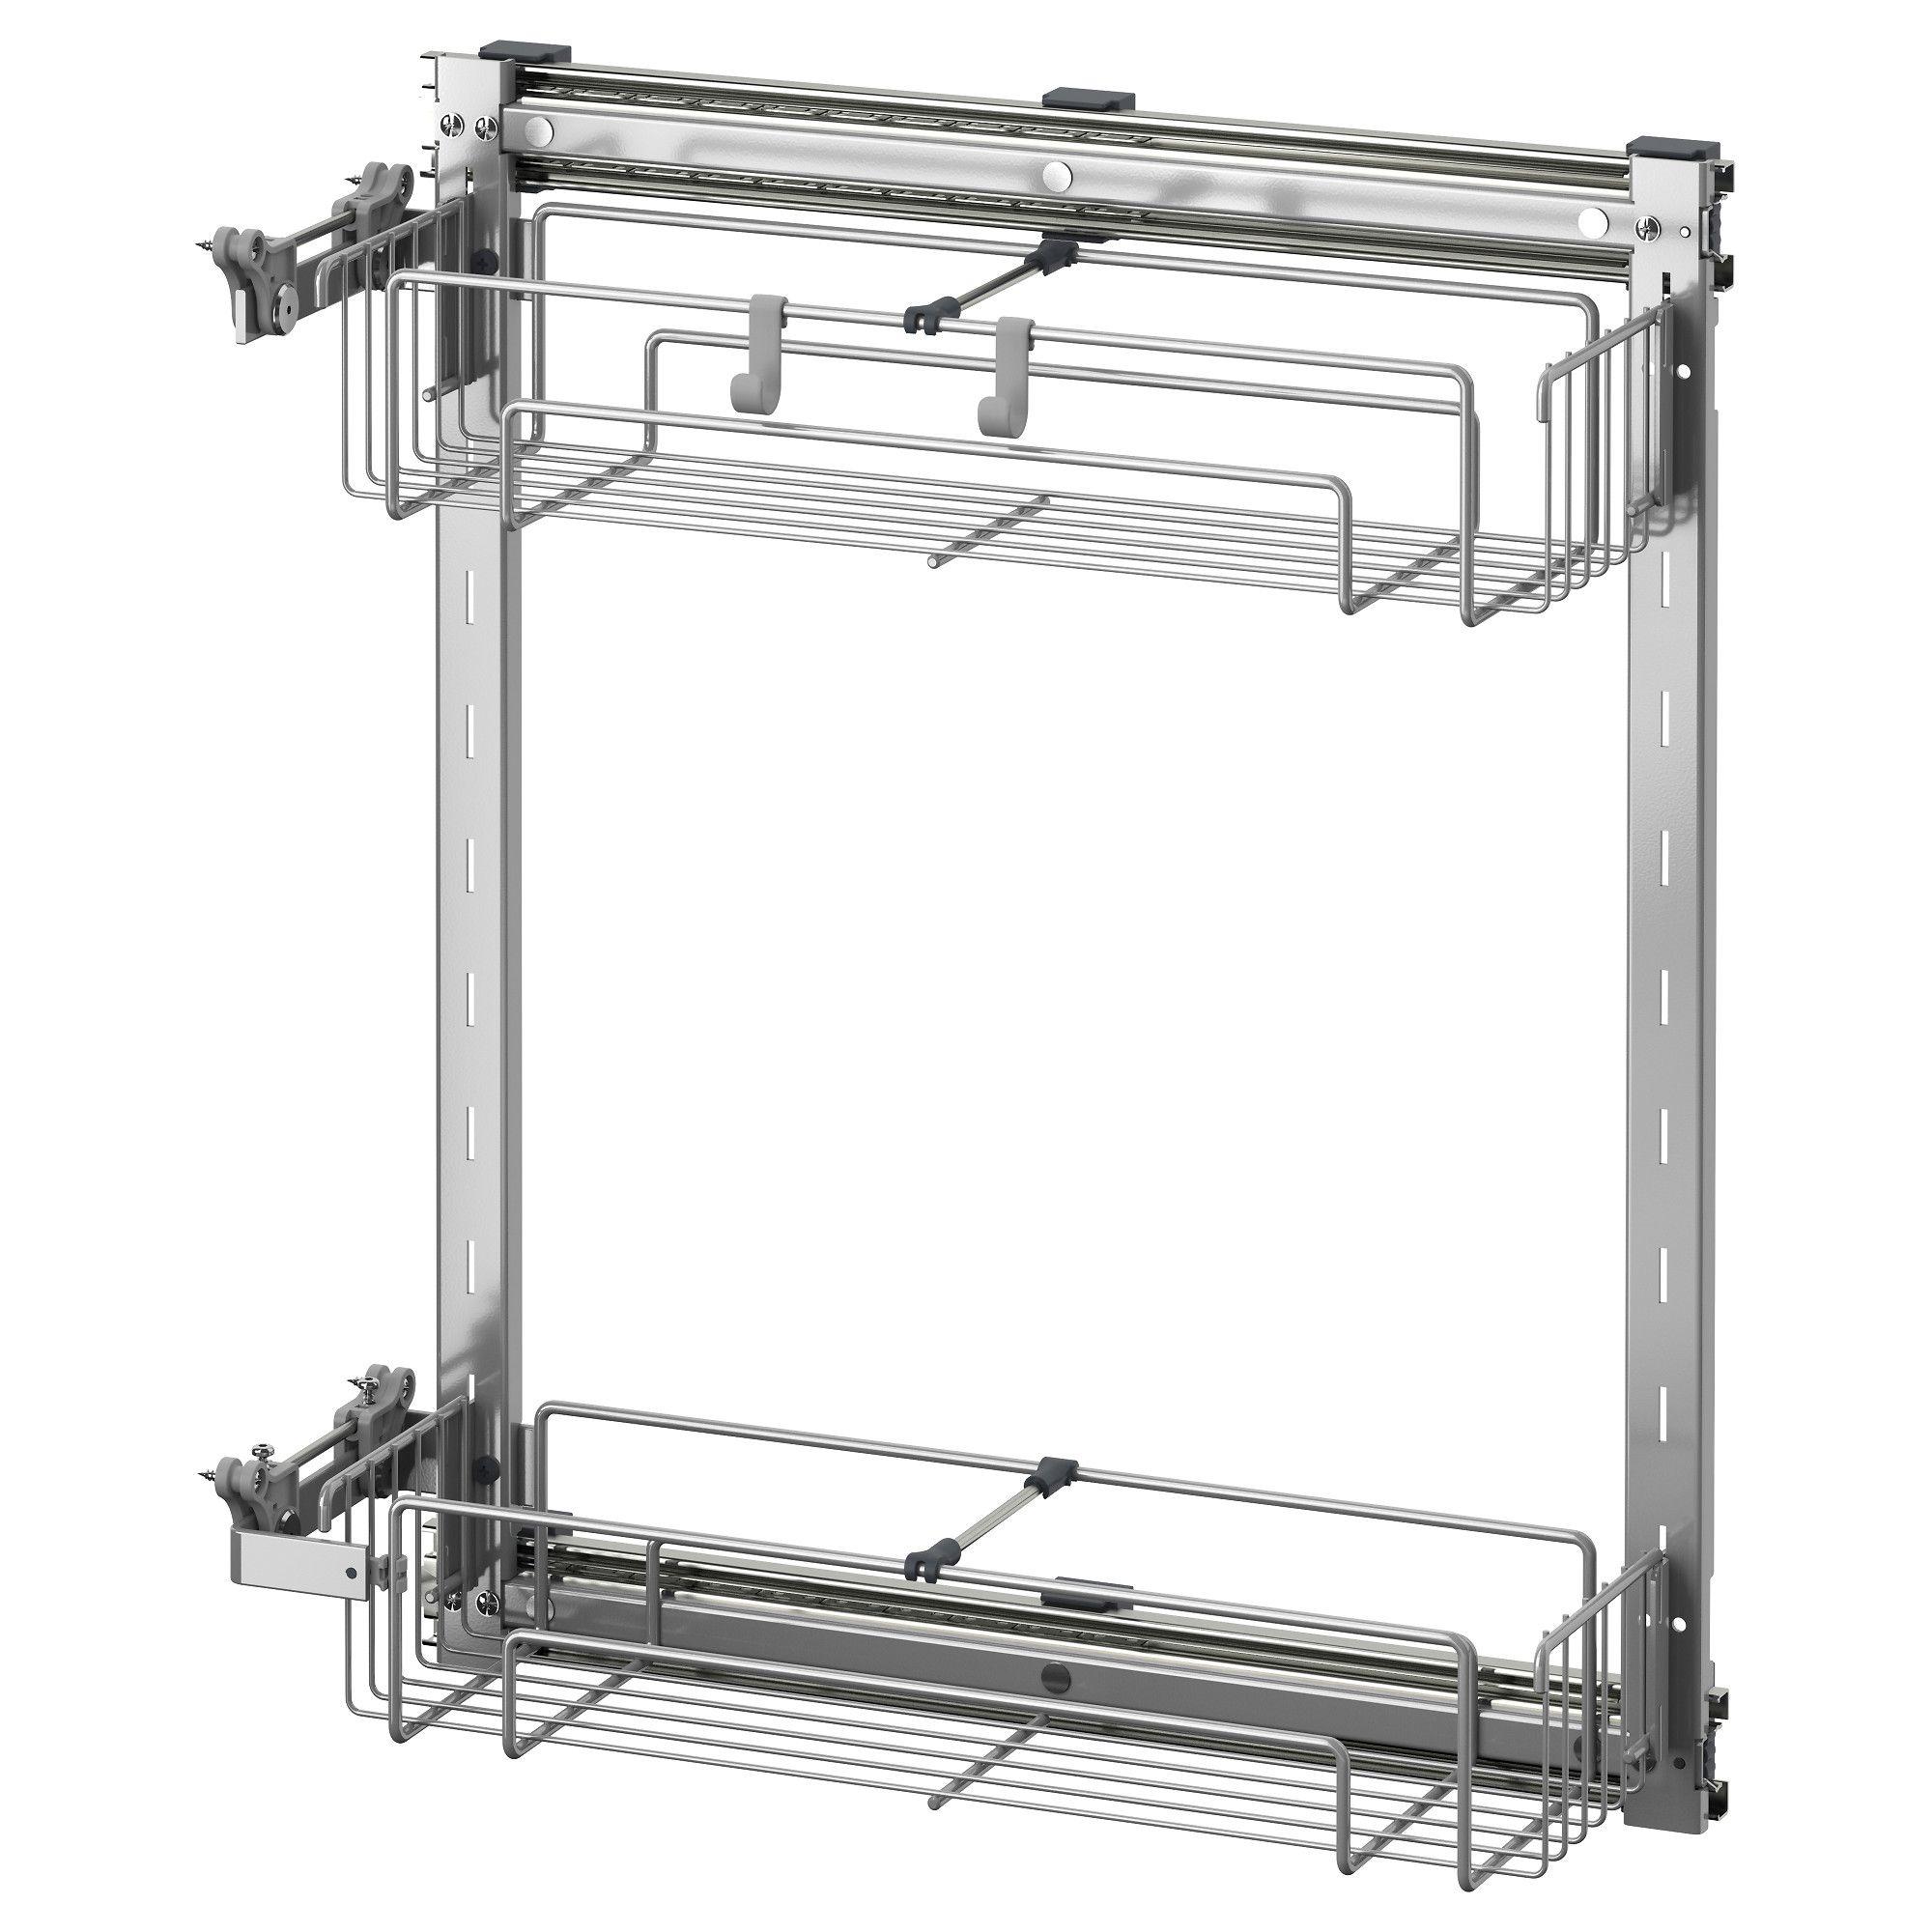 Utrusta Uittrekbare Kastinrichting Breedte 15 Cm Basiselement